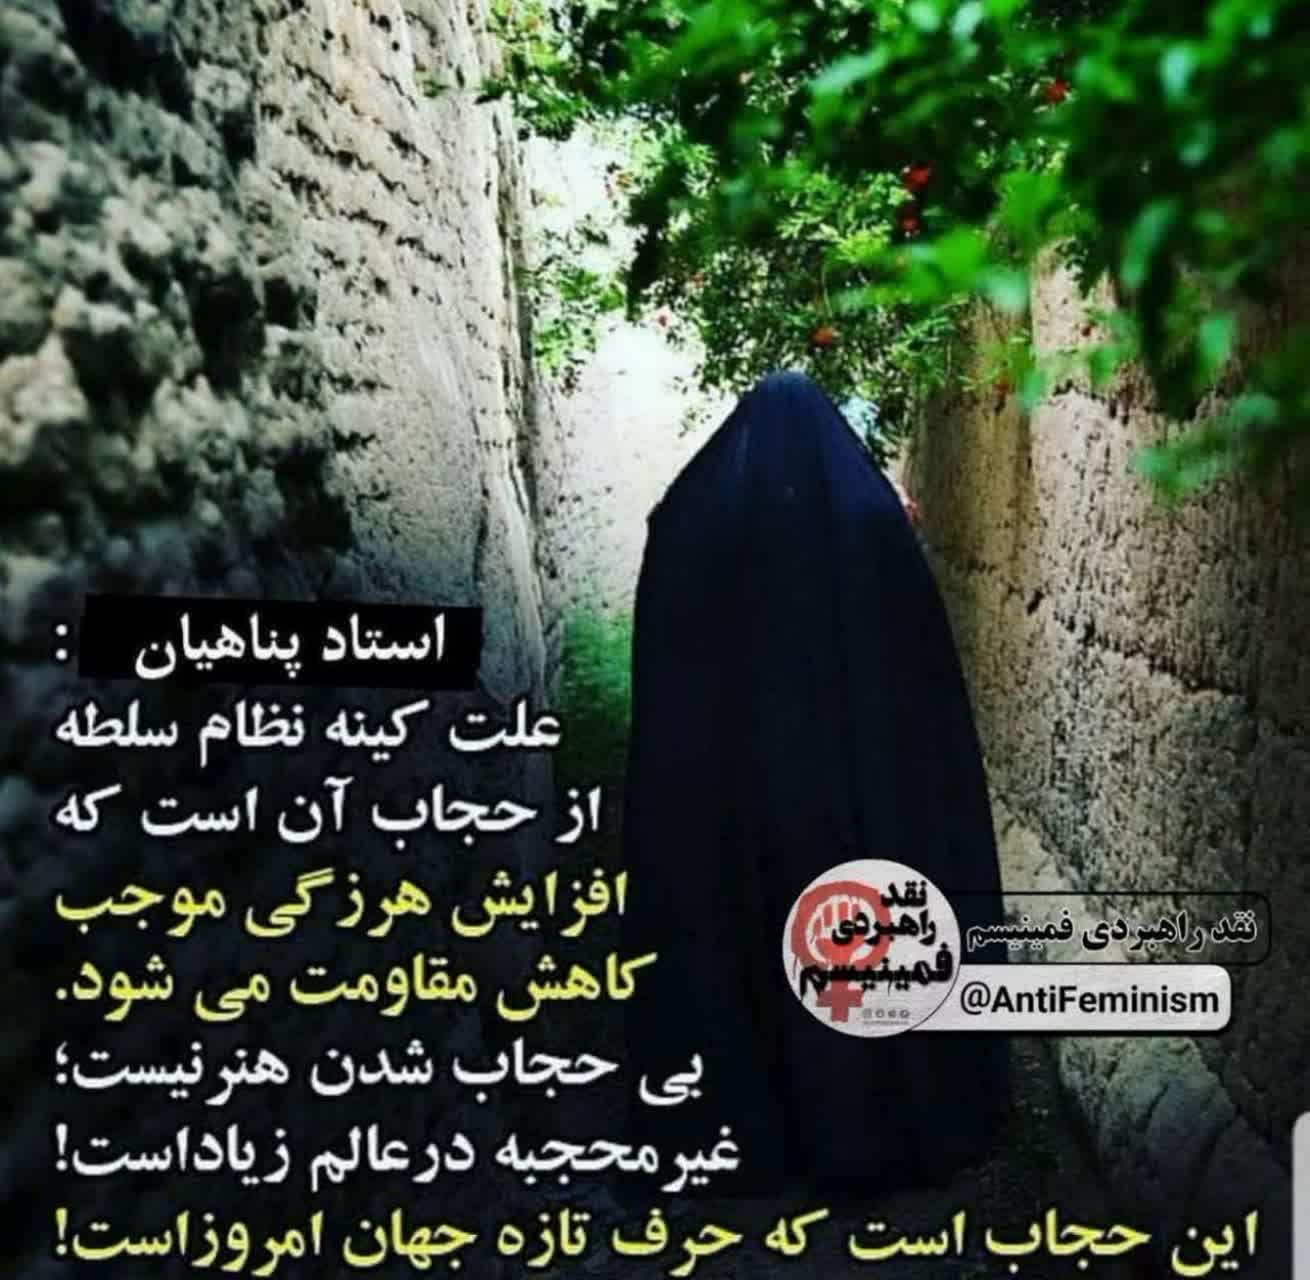 1562746616photo_2019-07-10_12-46-29.jpg